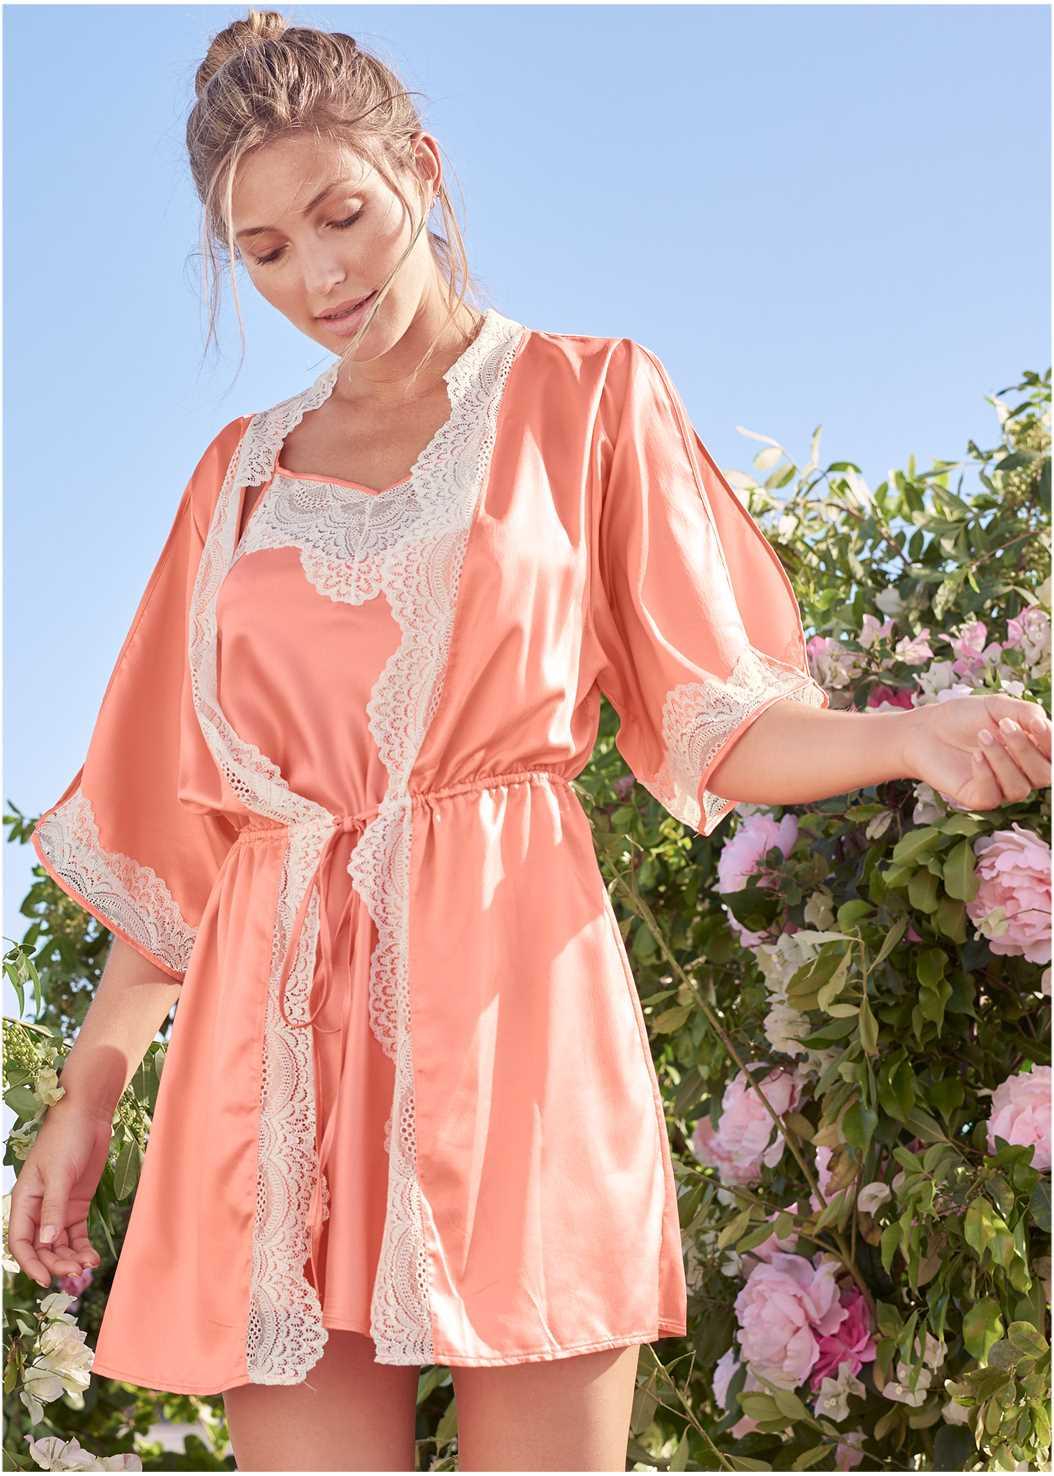 Lace Detail Kimono,Push Up Bra Buy 2 For $40